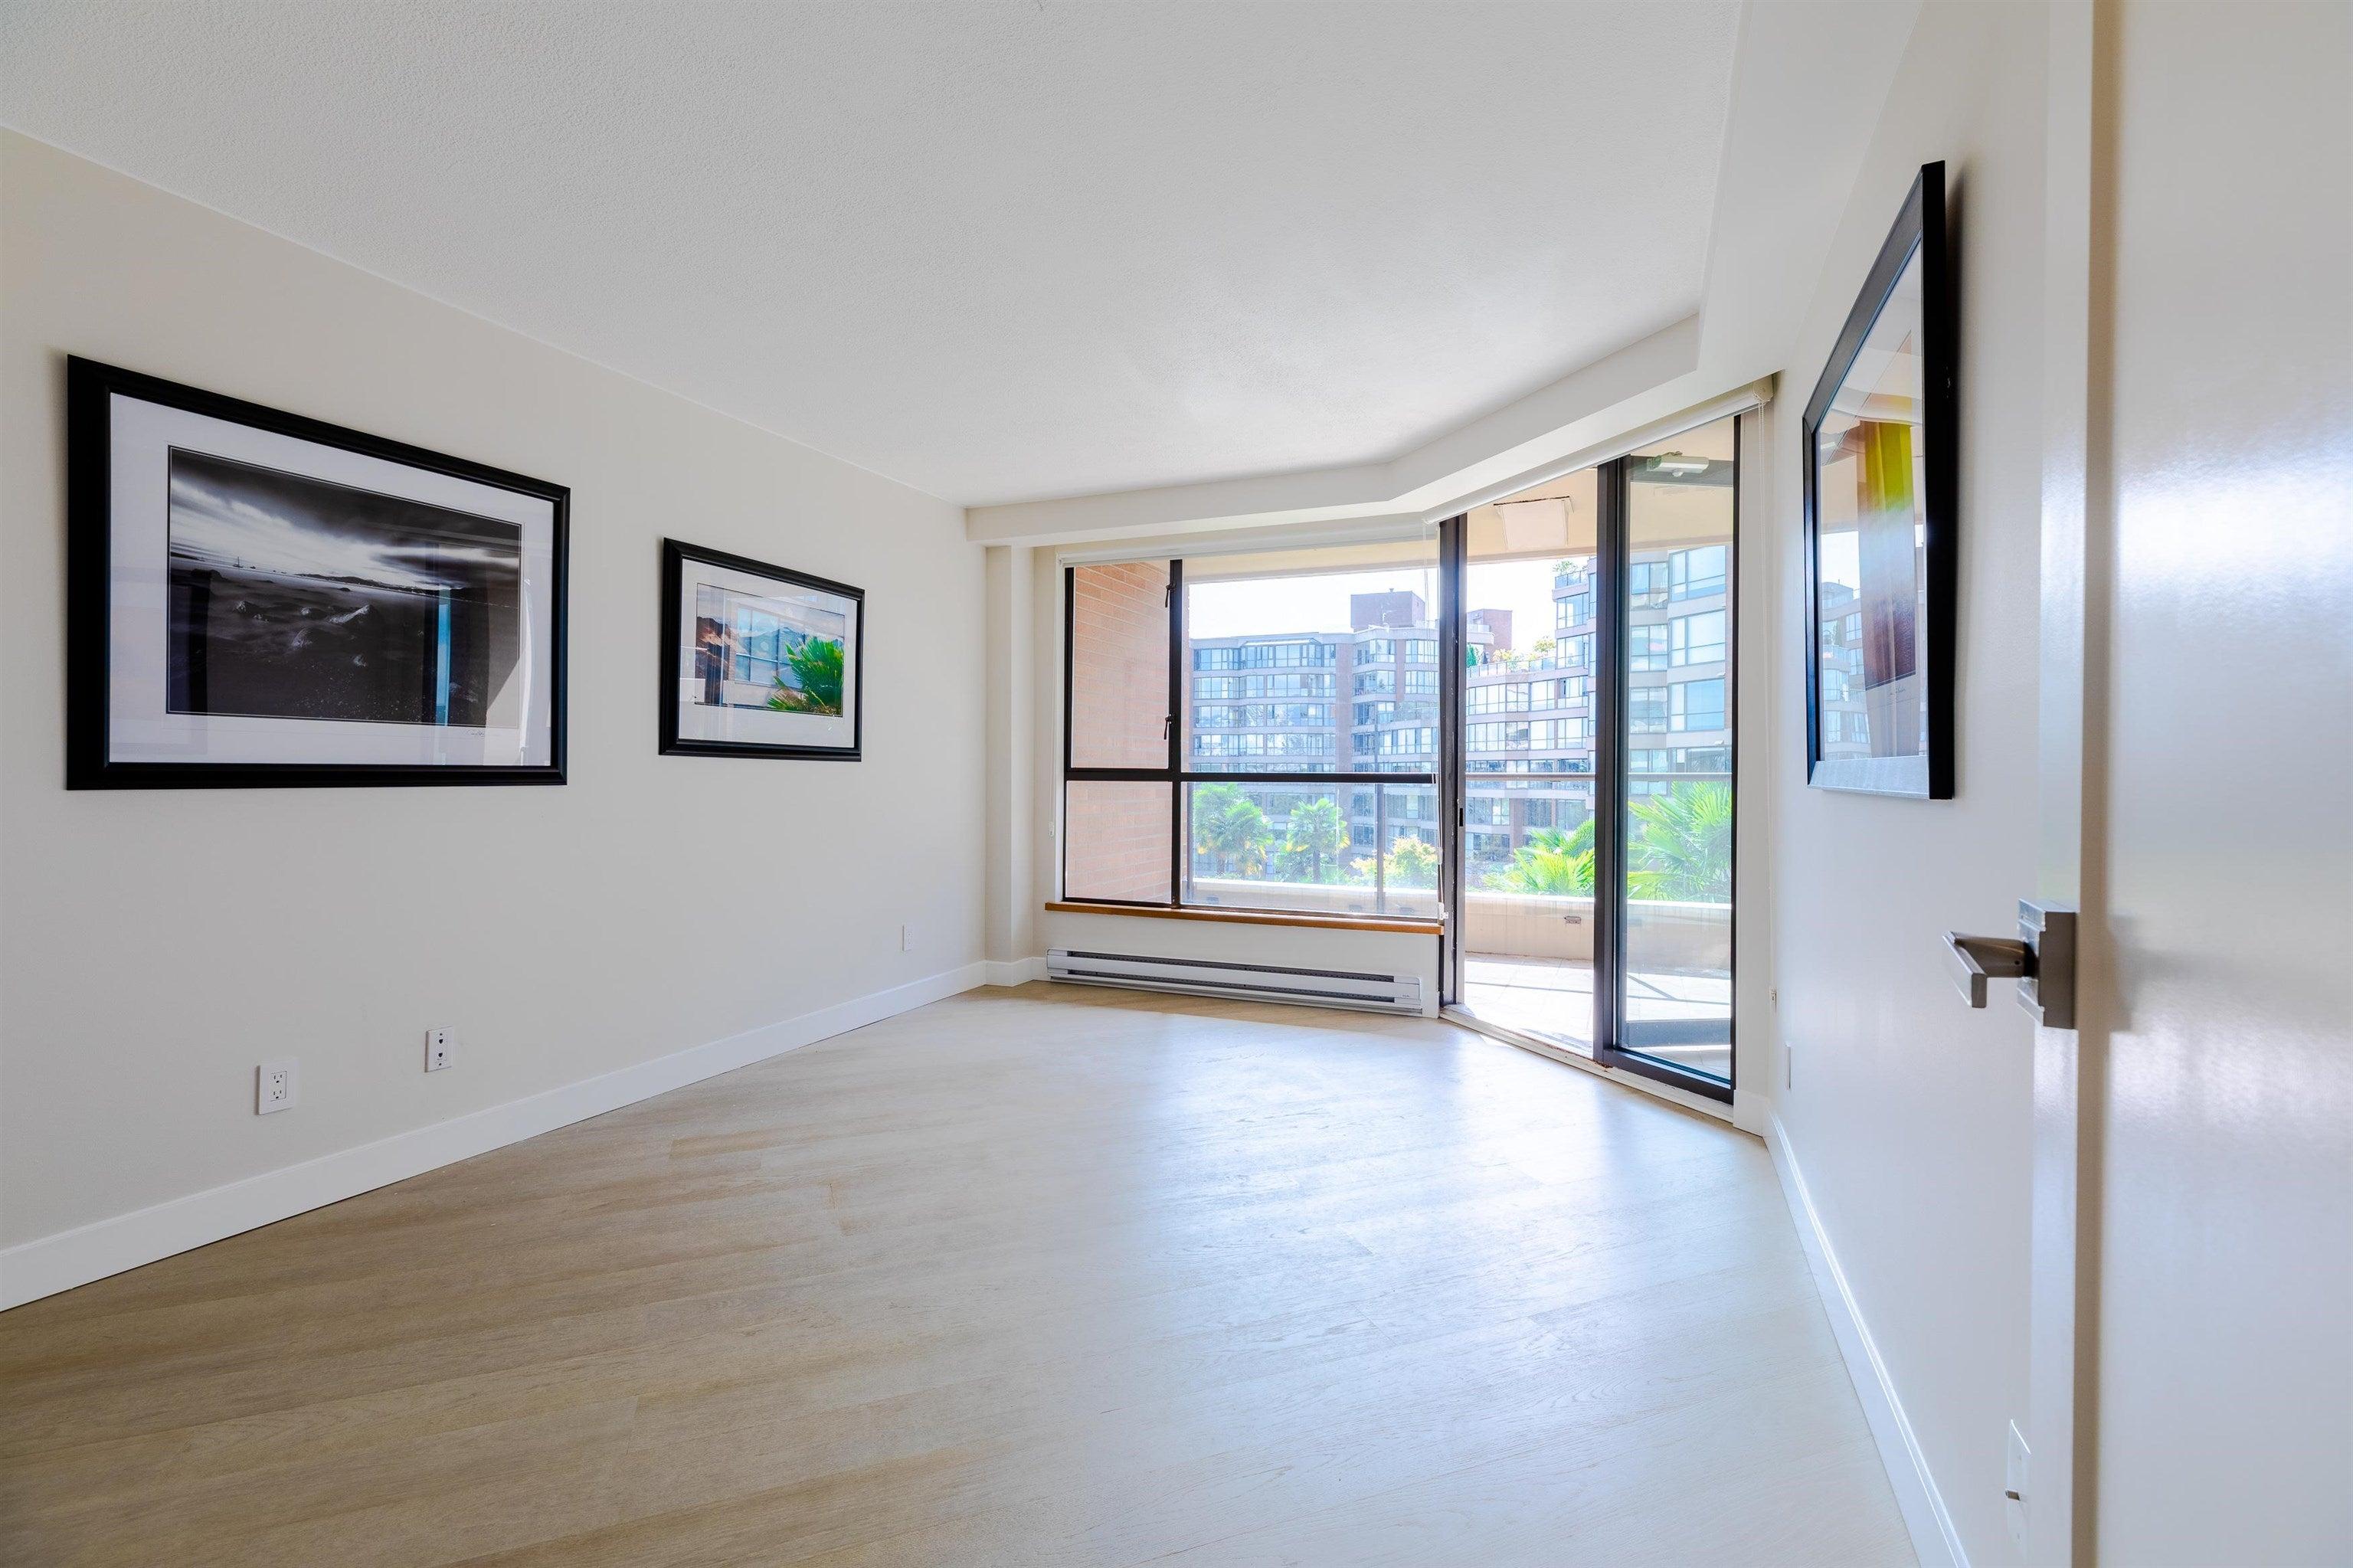 406 1450 PENNYFARTHING DRIVE - False Creek Apartment/Condo for sale, 2 Bedrooms (R2617259) - #21